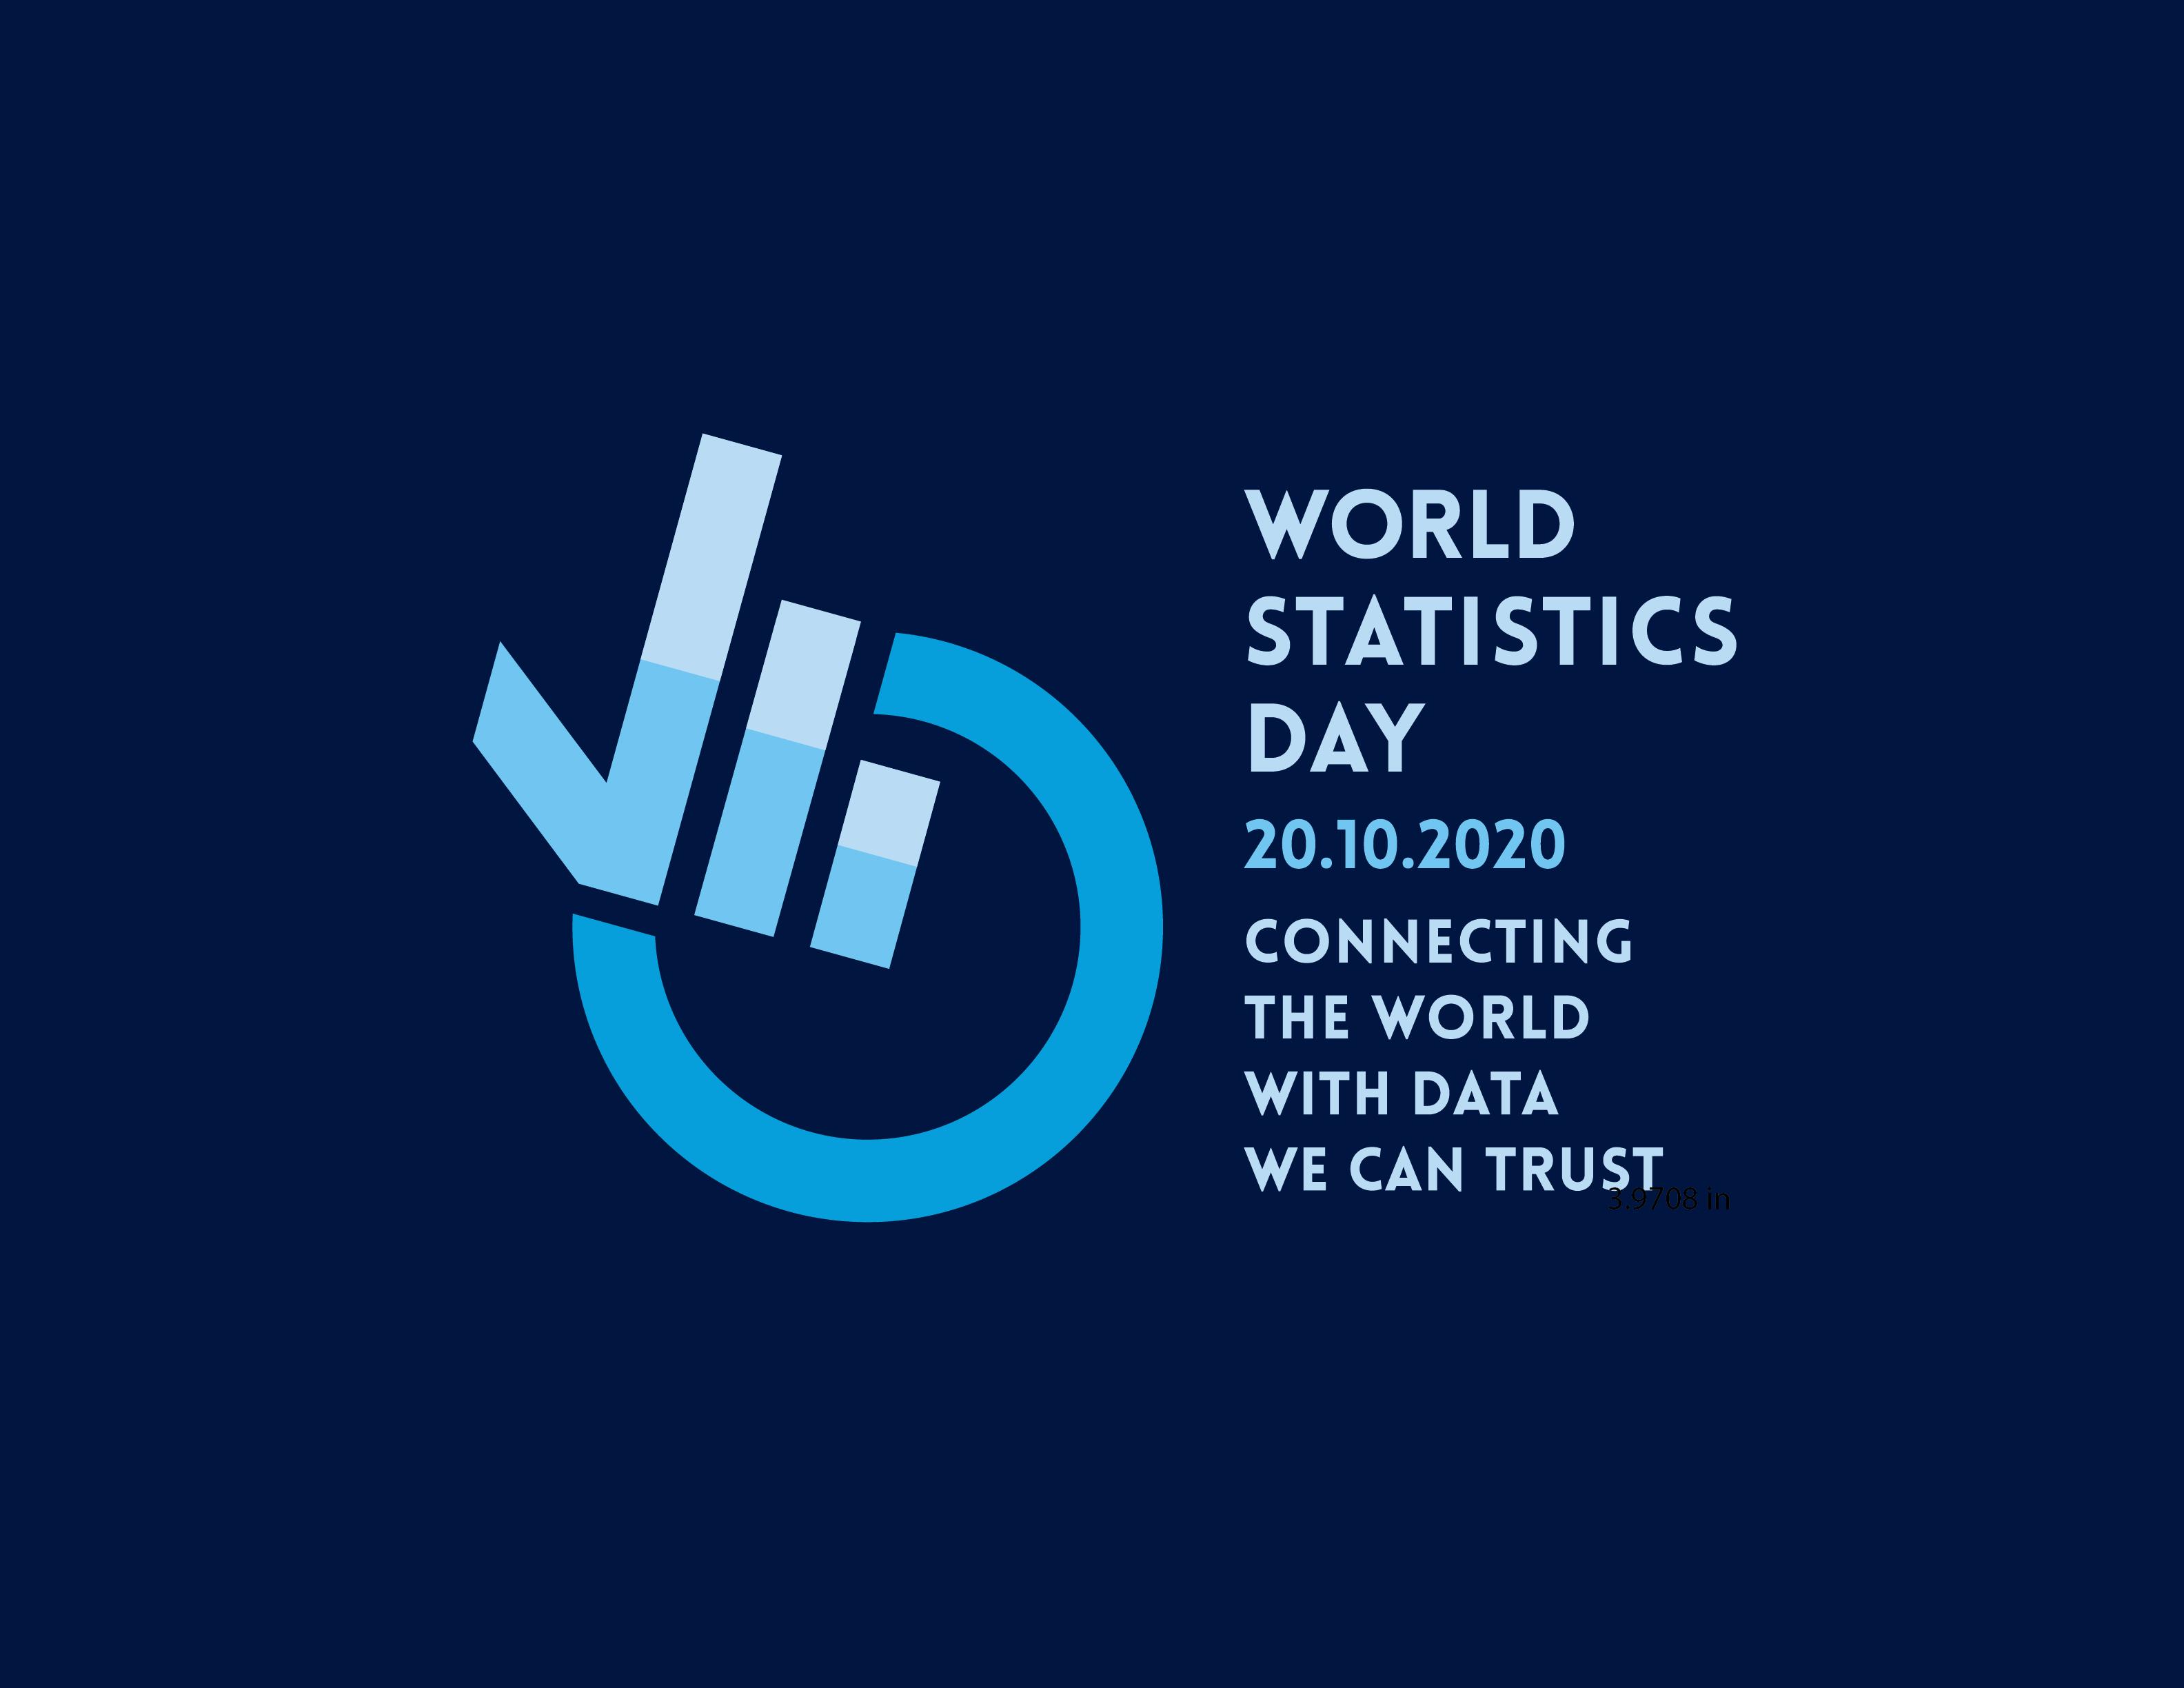 World-Statistics-Day-2020-Logo_darkbluebg_EN.png